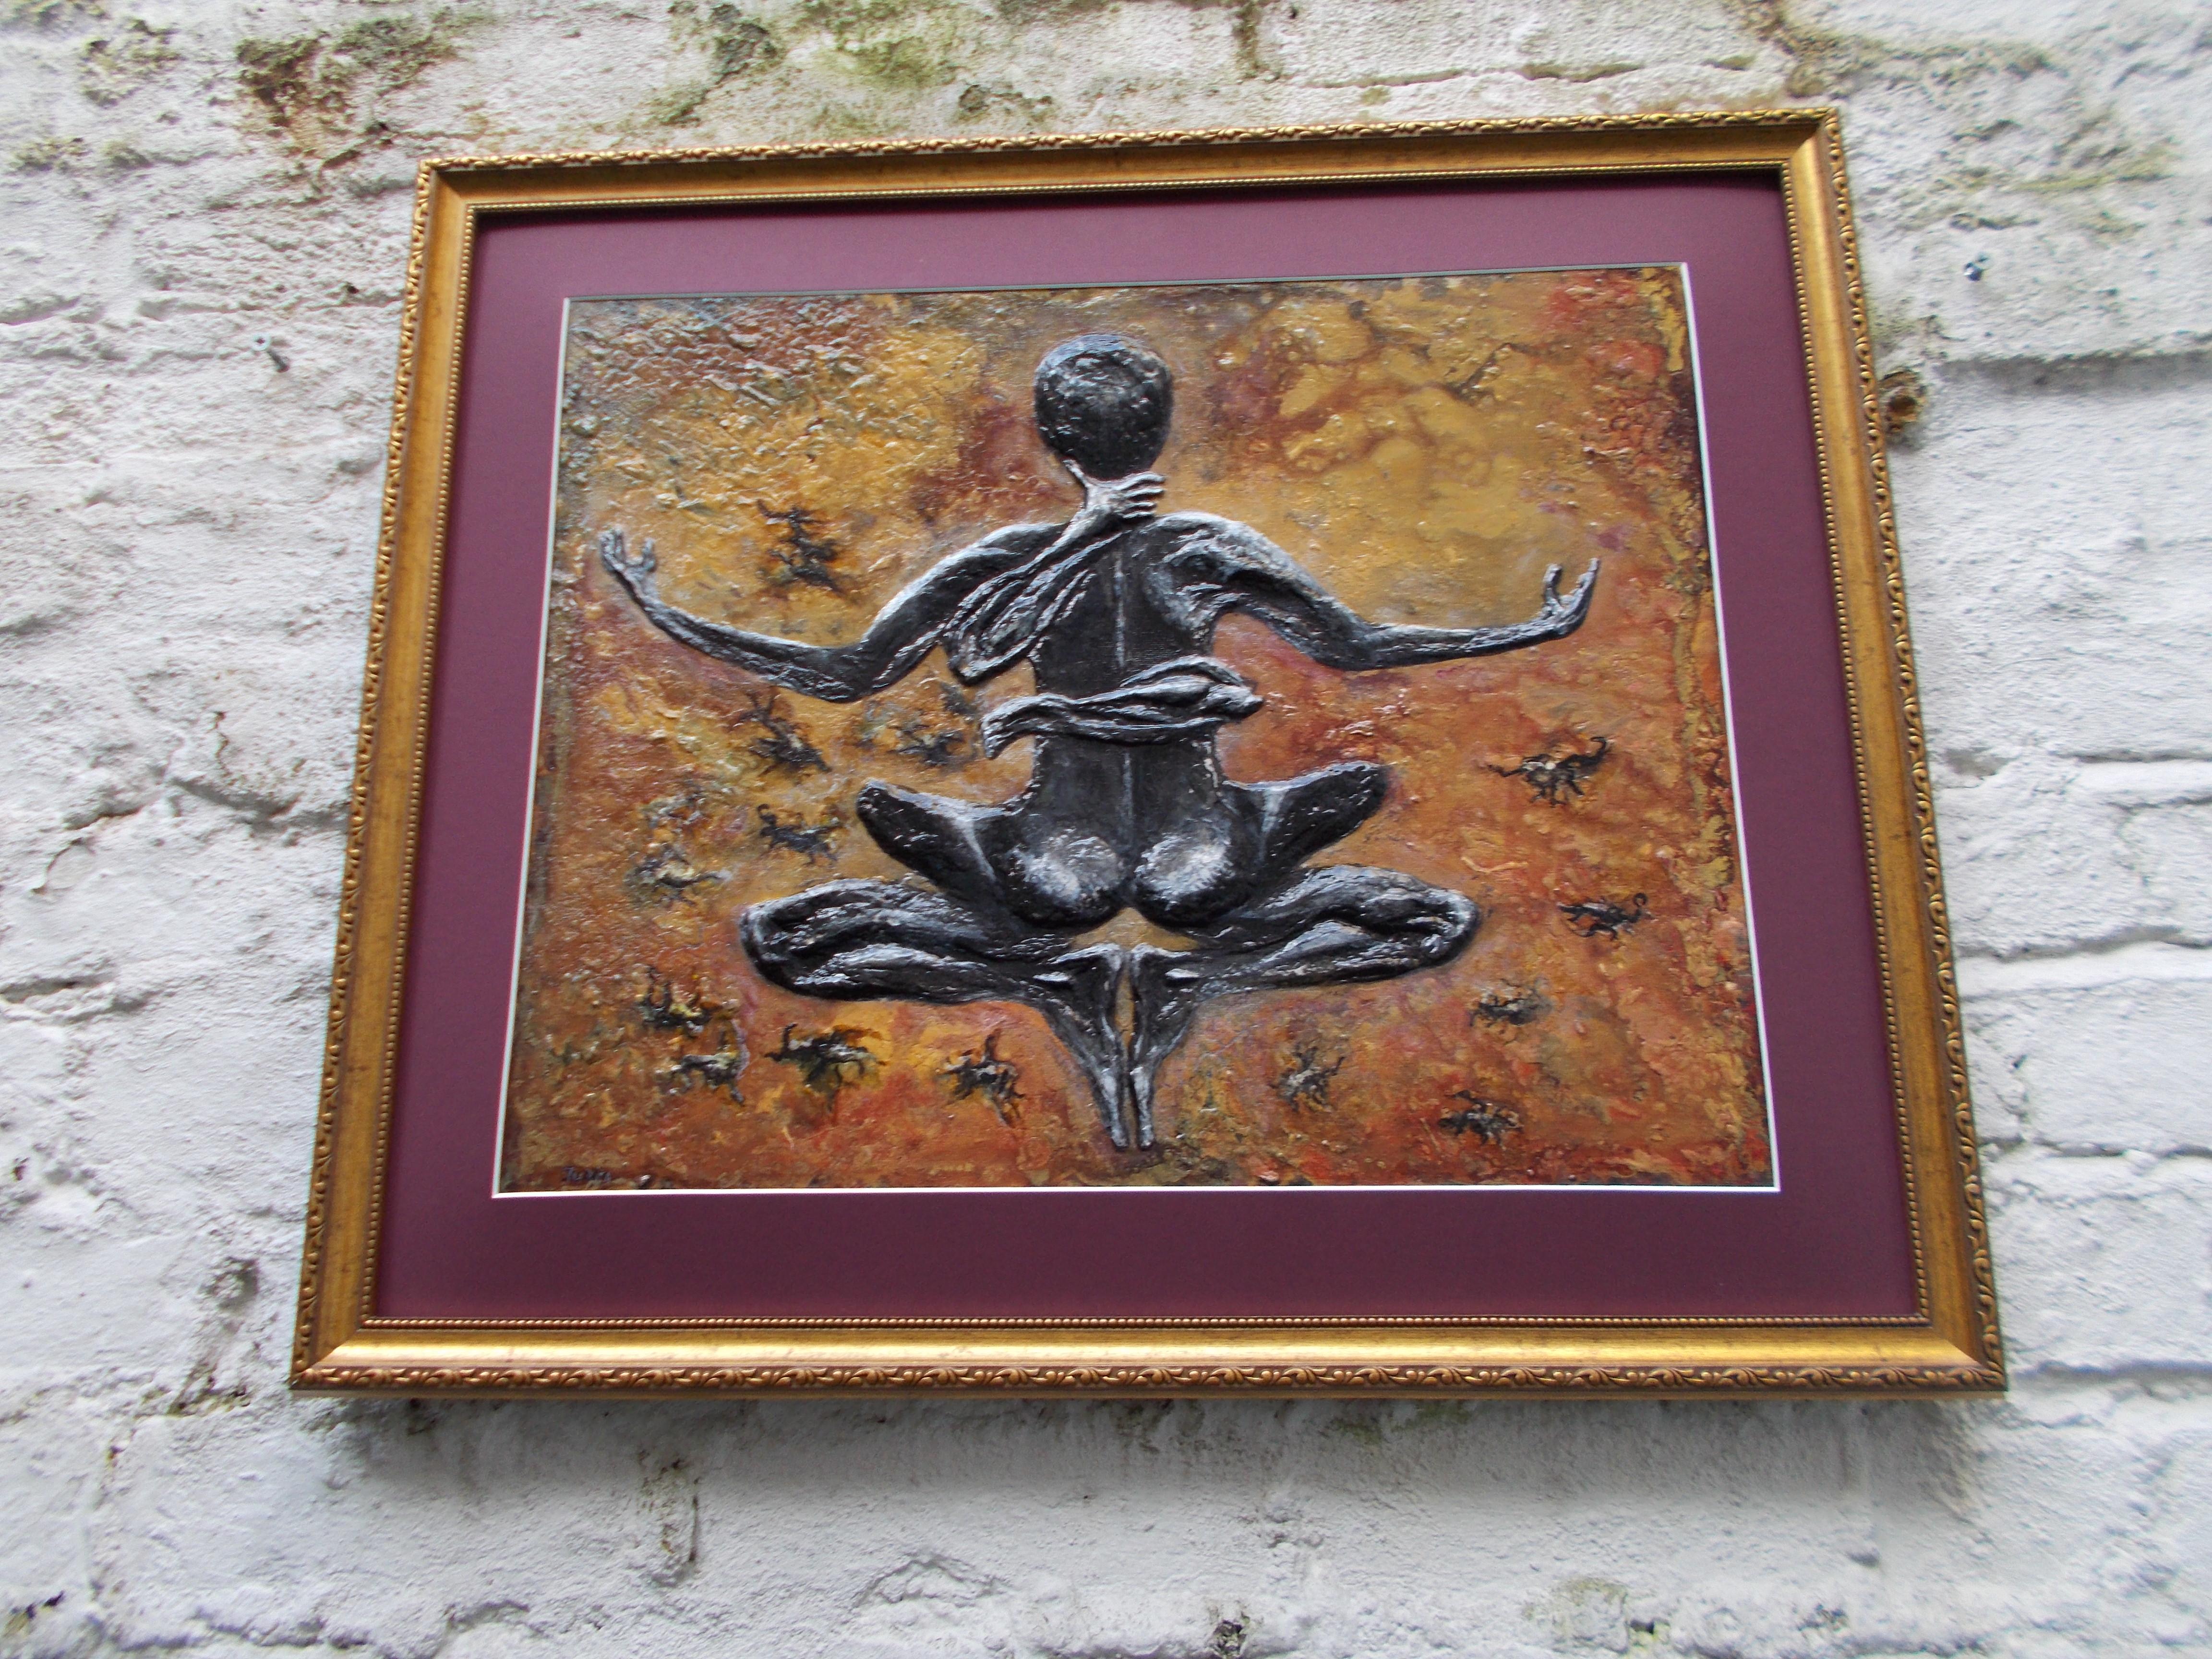 Scorpio-The-Scorpion-Oct 23-Nov 21-Jurita-2019-Painting Relief 3D-mixed-media-acrylic-clay-40x50cm© (12)